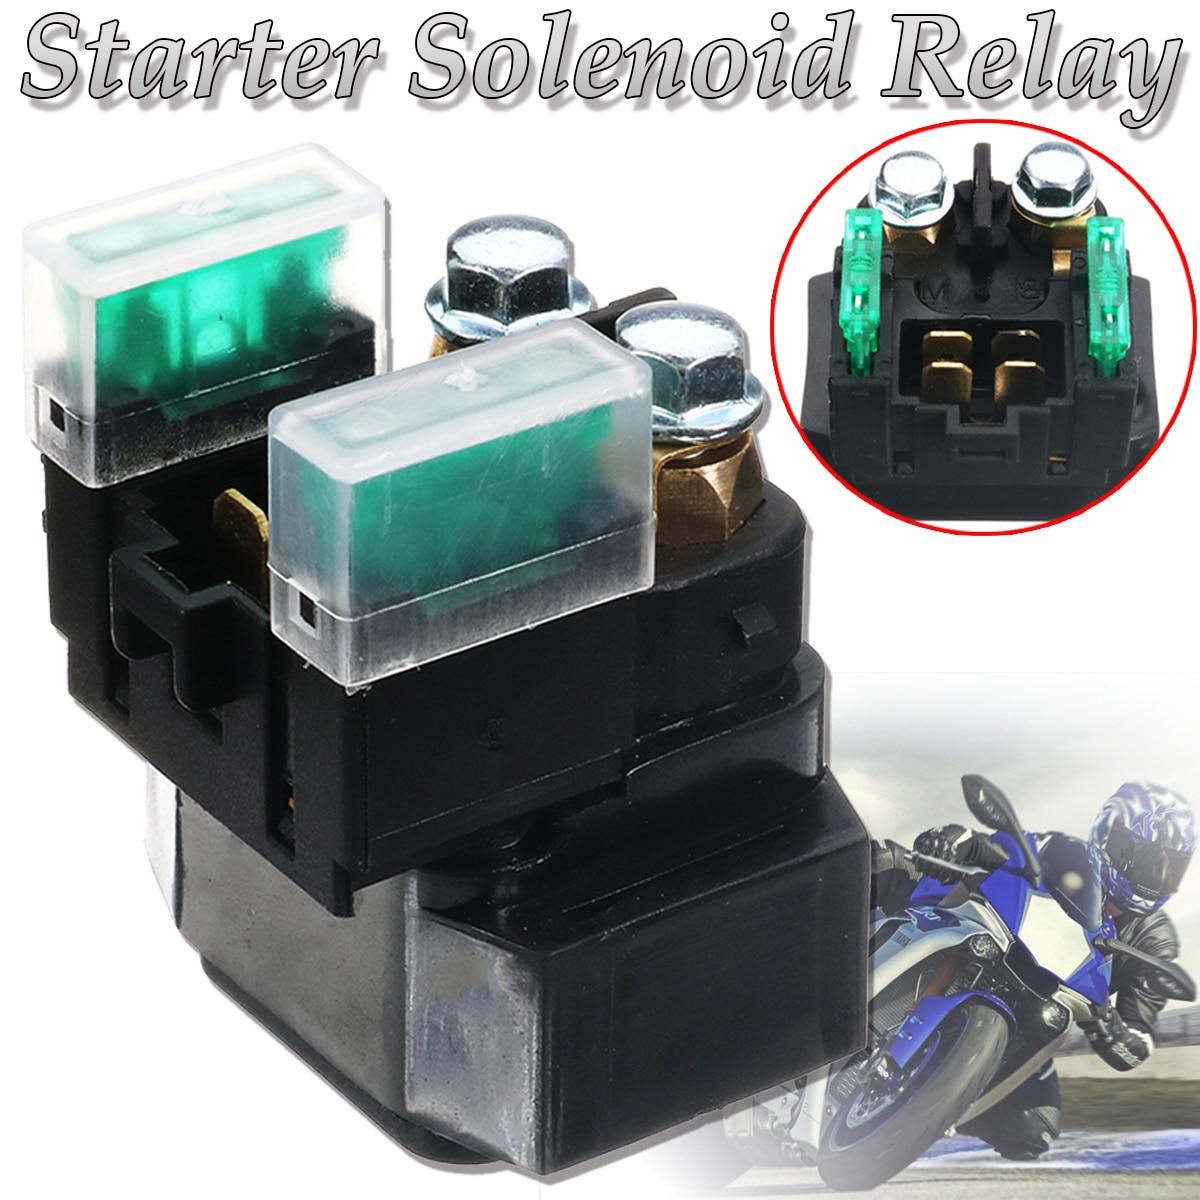 Motorcycle Electrical Parts Starter Solenoid Relay for Yamaha YFM 350/400/450/660 Grizzly Kodiak Raptor